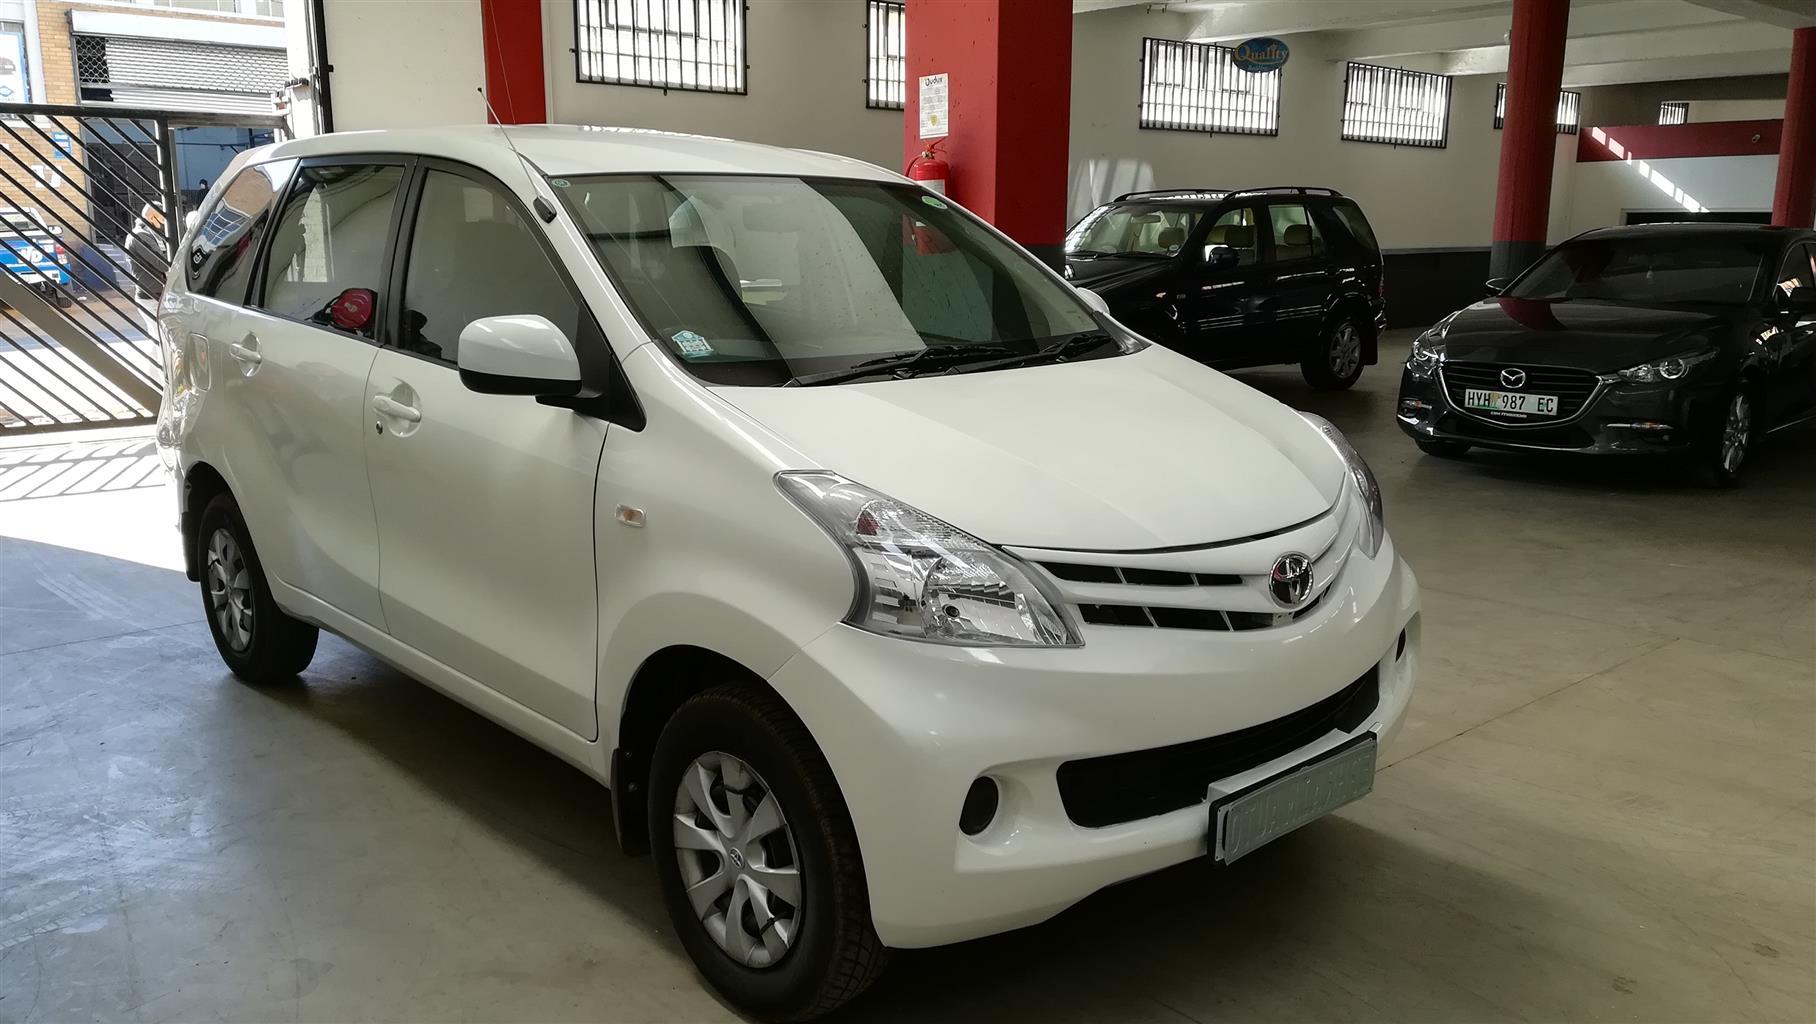 Kekurangan Toyota Avanza 2014 Tangguh